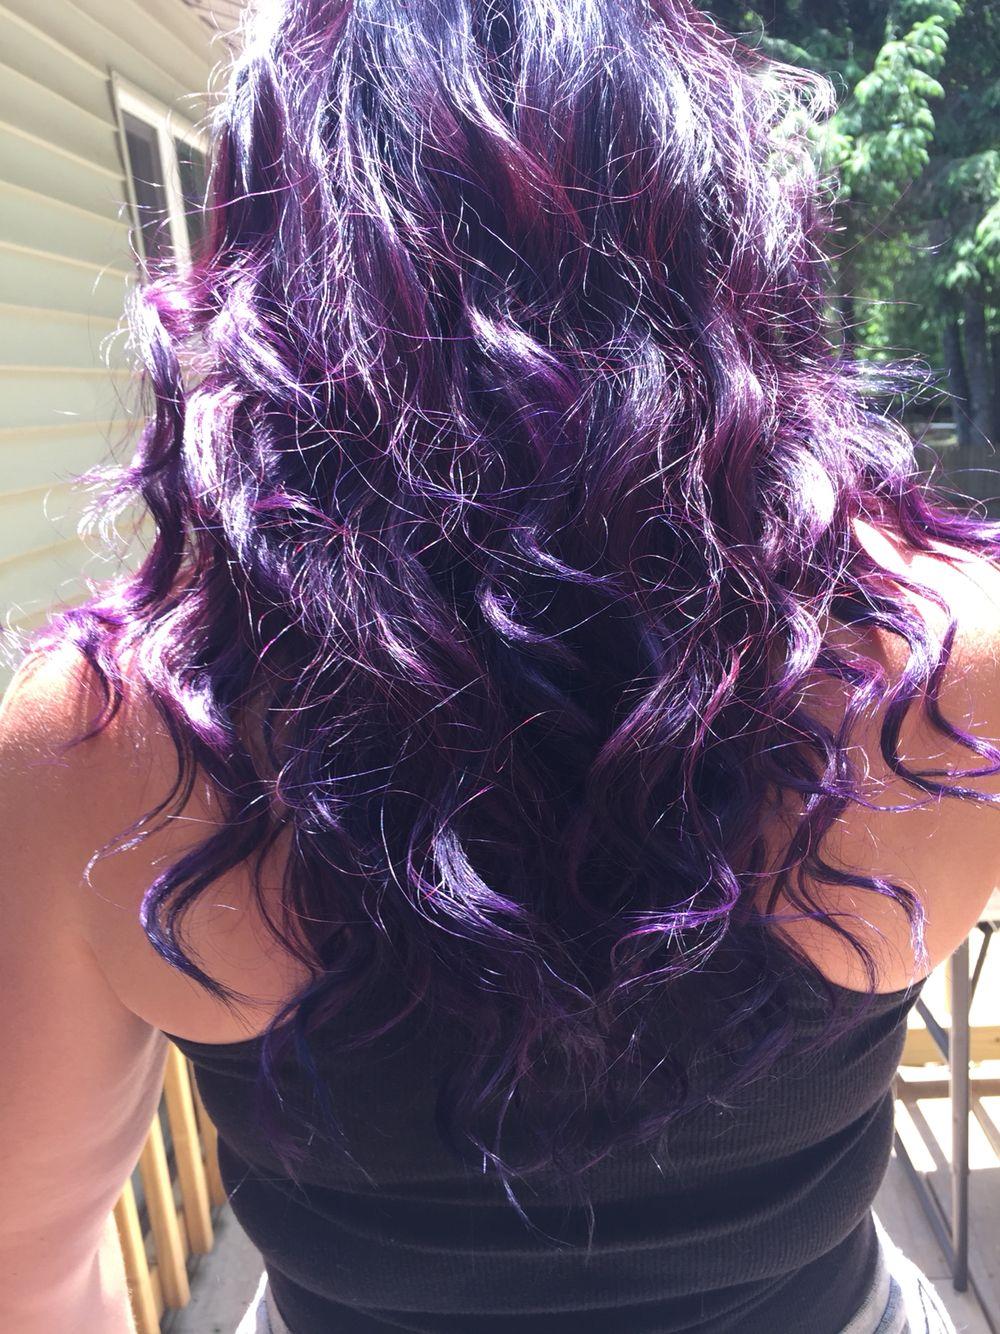 Splat Lusty Lavender Best Hair Color I Have Had So Far Splat Purple Hair Dye Dyed Hair Purple Purple Hair